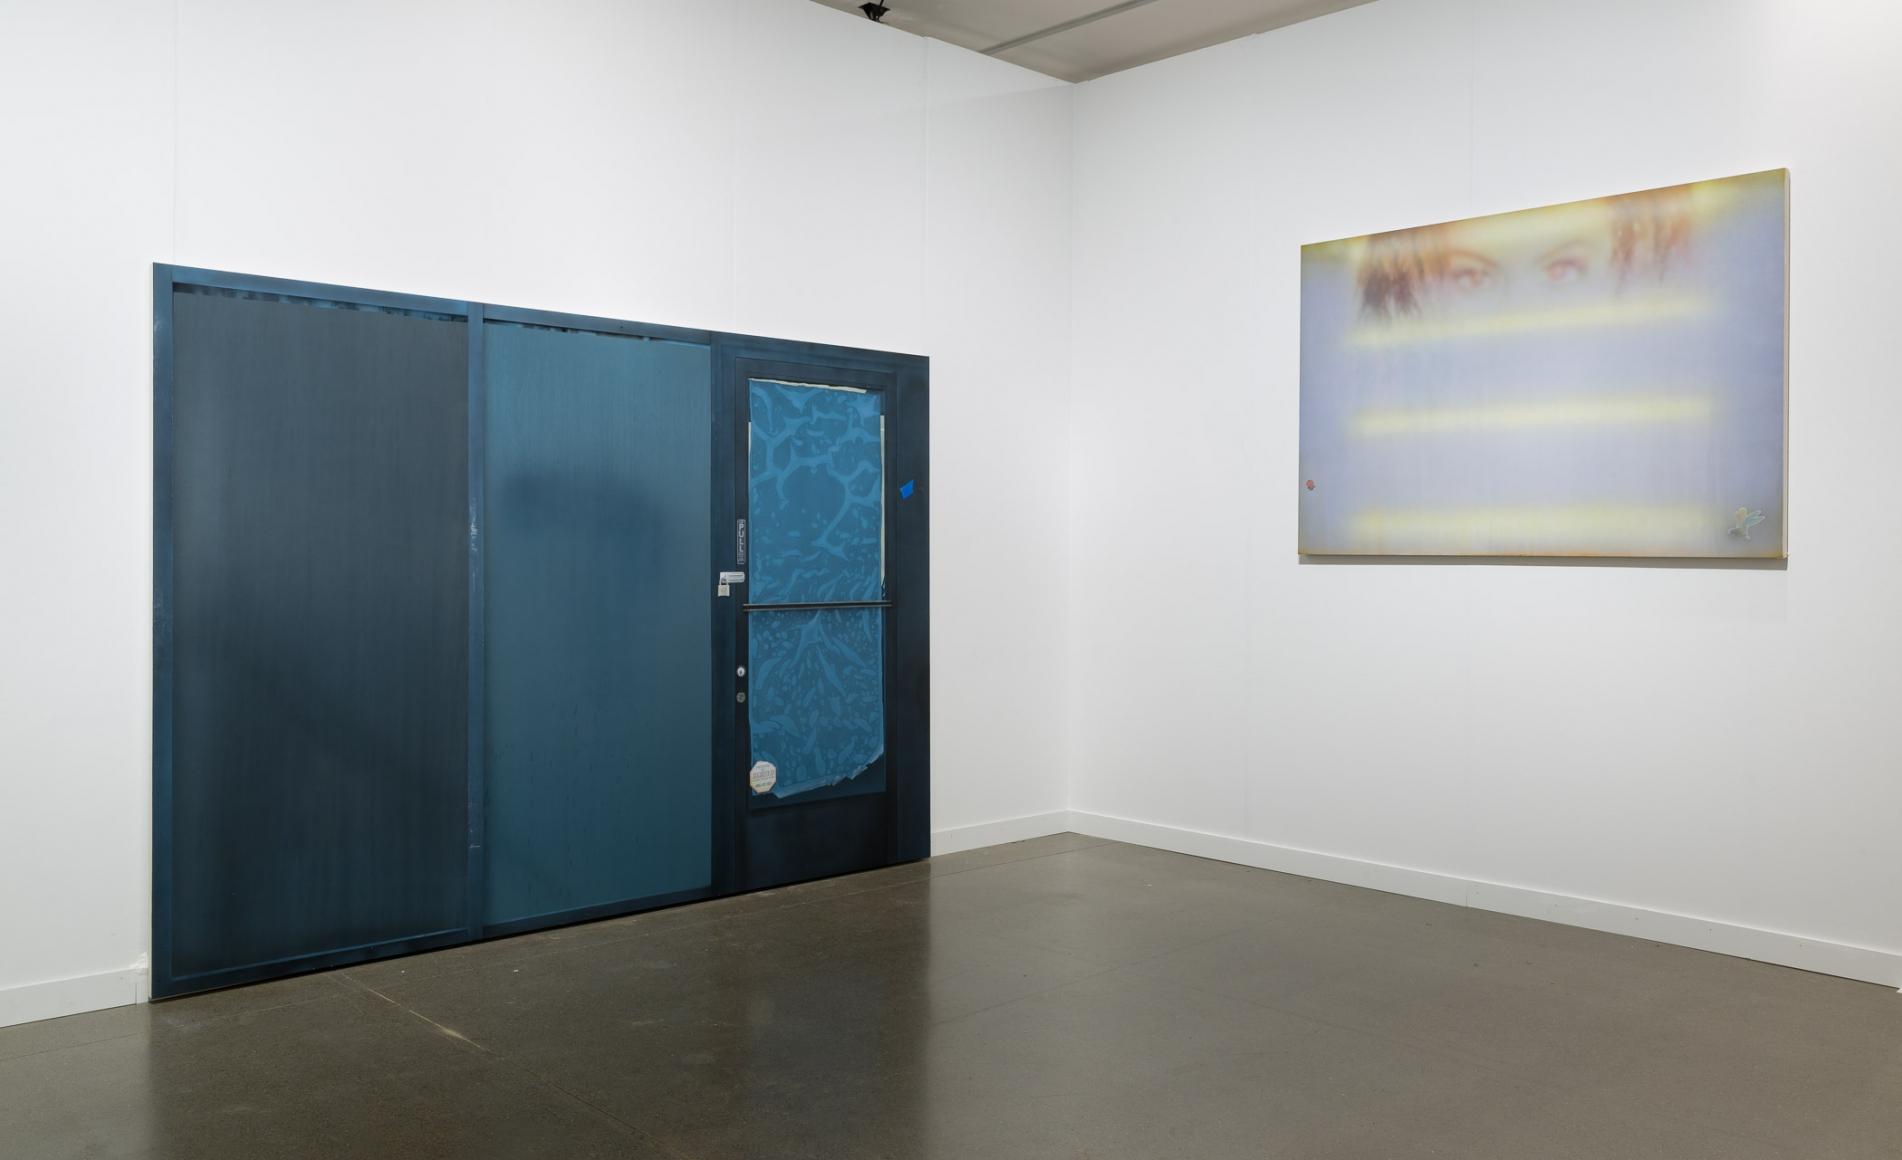 Galerie Nagel Draxler - Galleries - Independent Art Fair